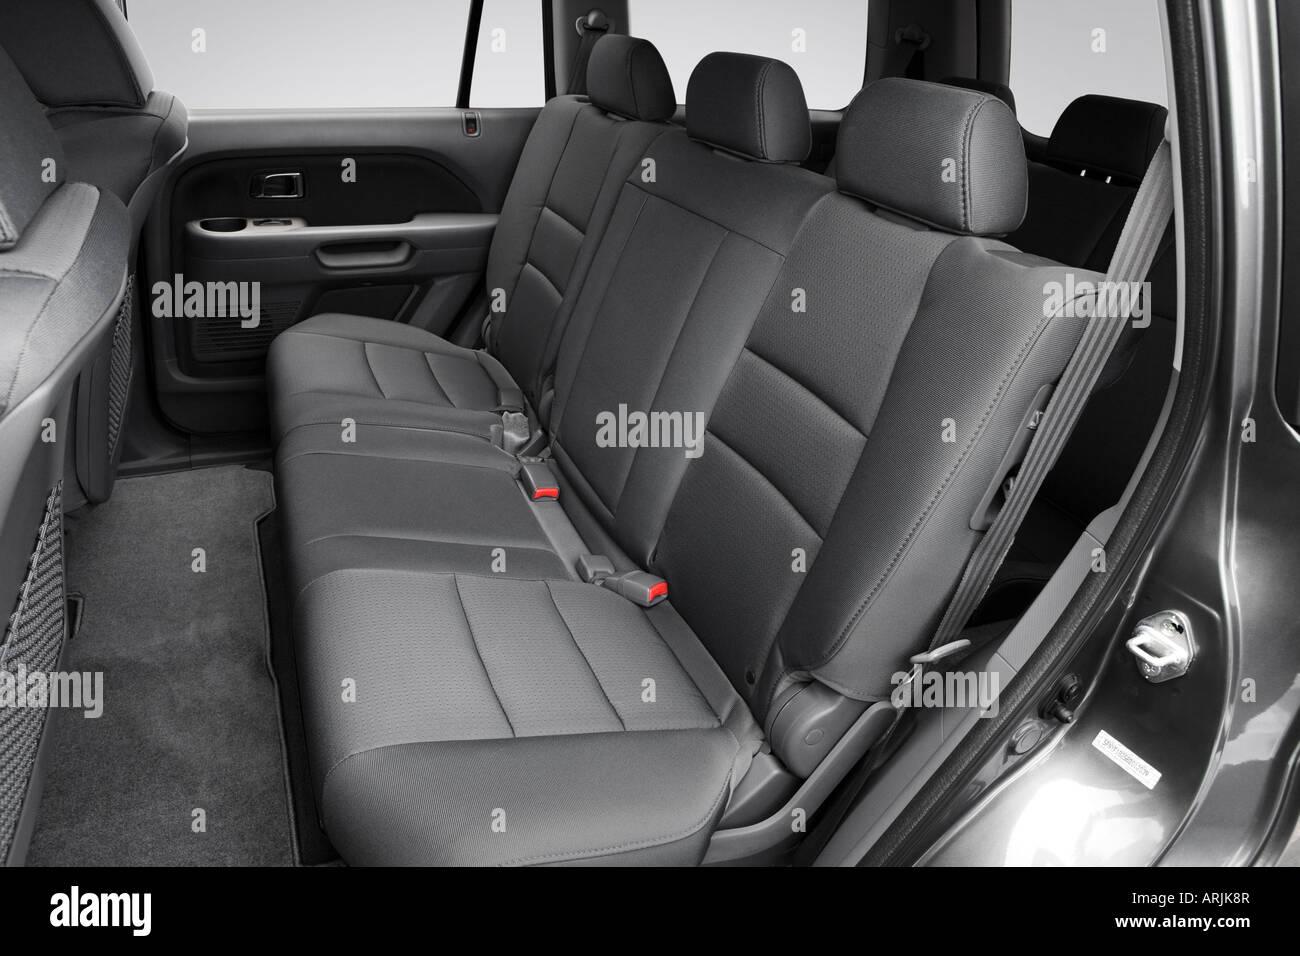 2008 honda pilot vp in gray rear seats stock photo for Honda pilot seating